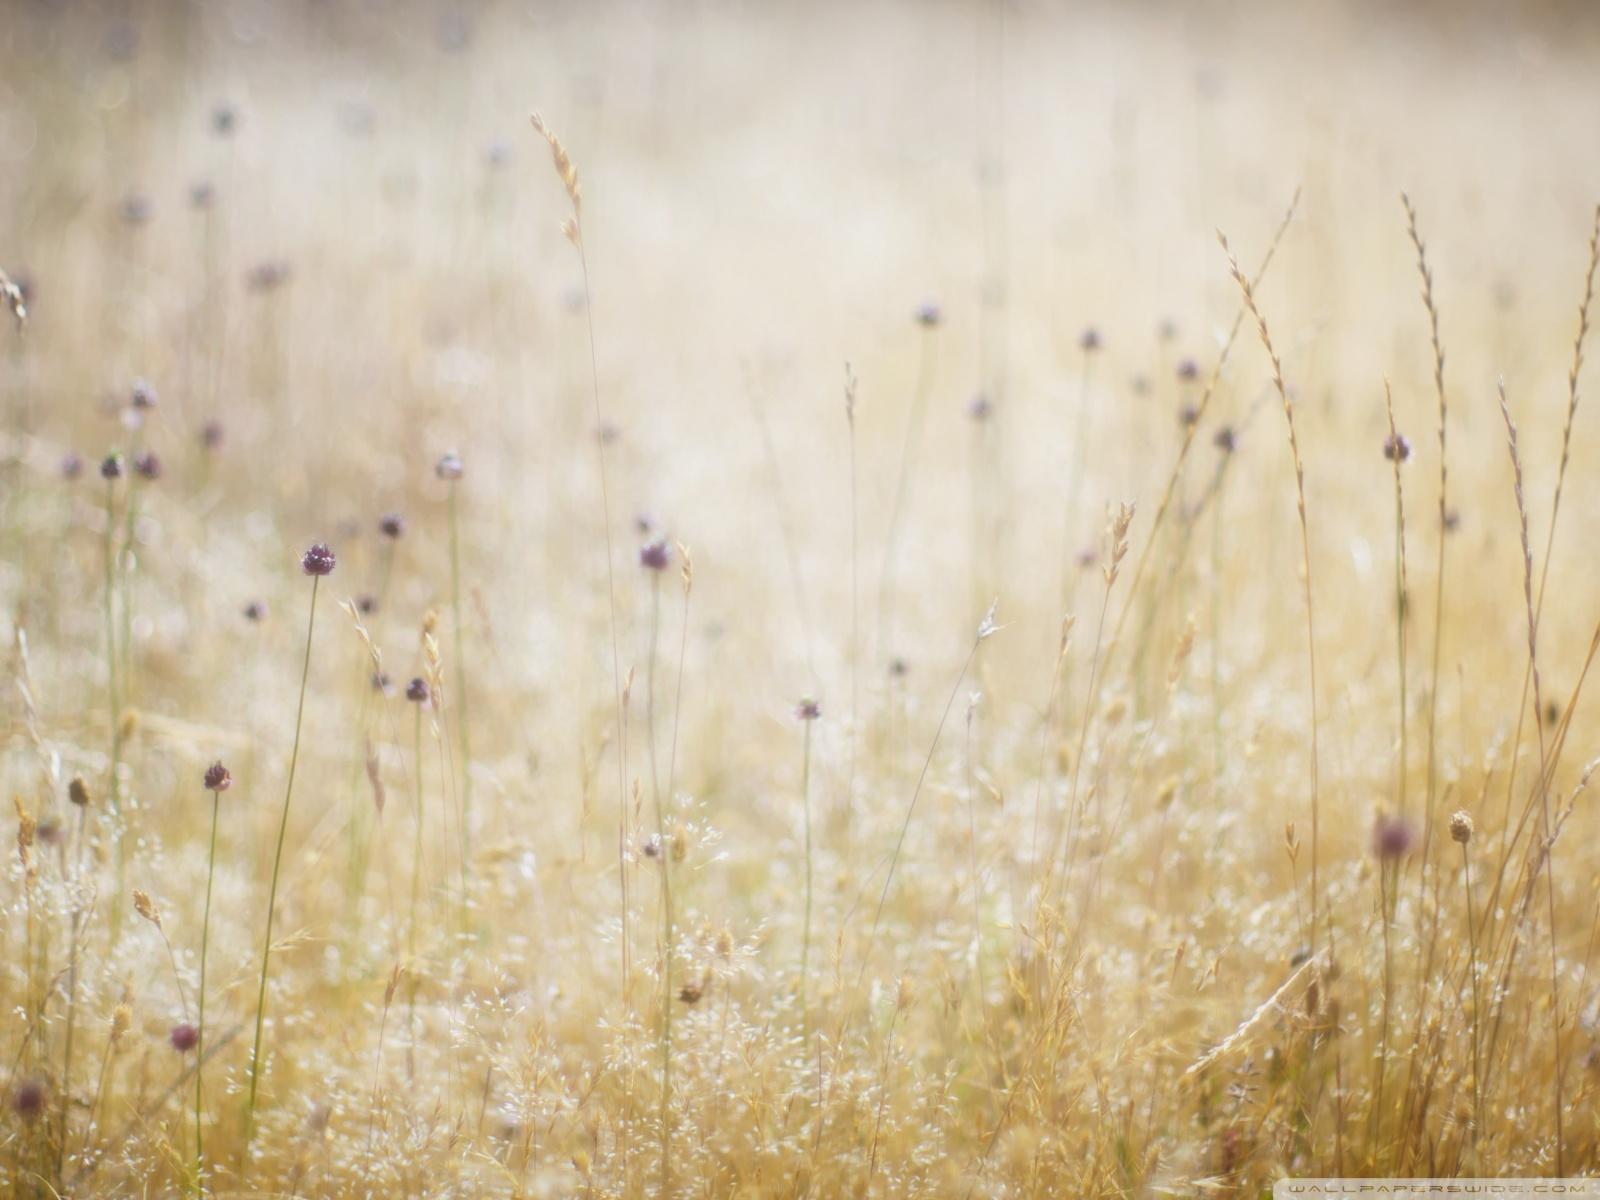 Free Field Of Wildflowers phone wallpaper by lilmunkey2233